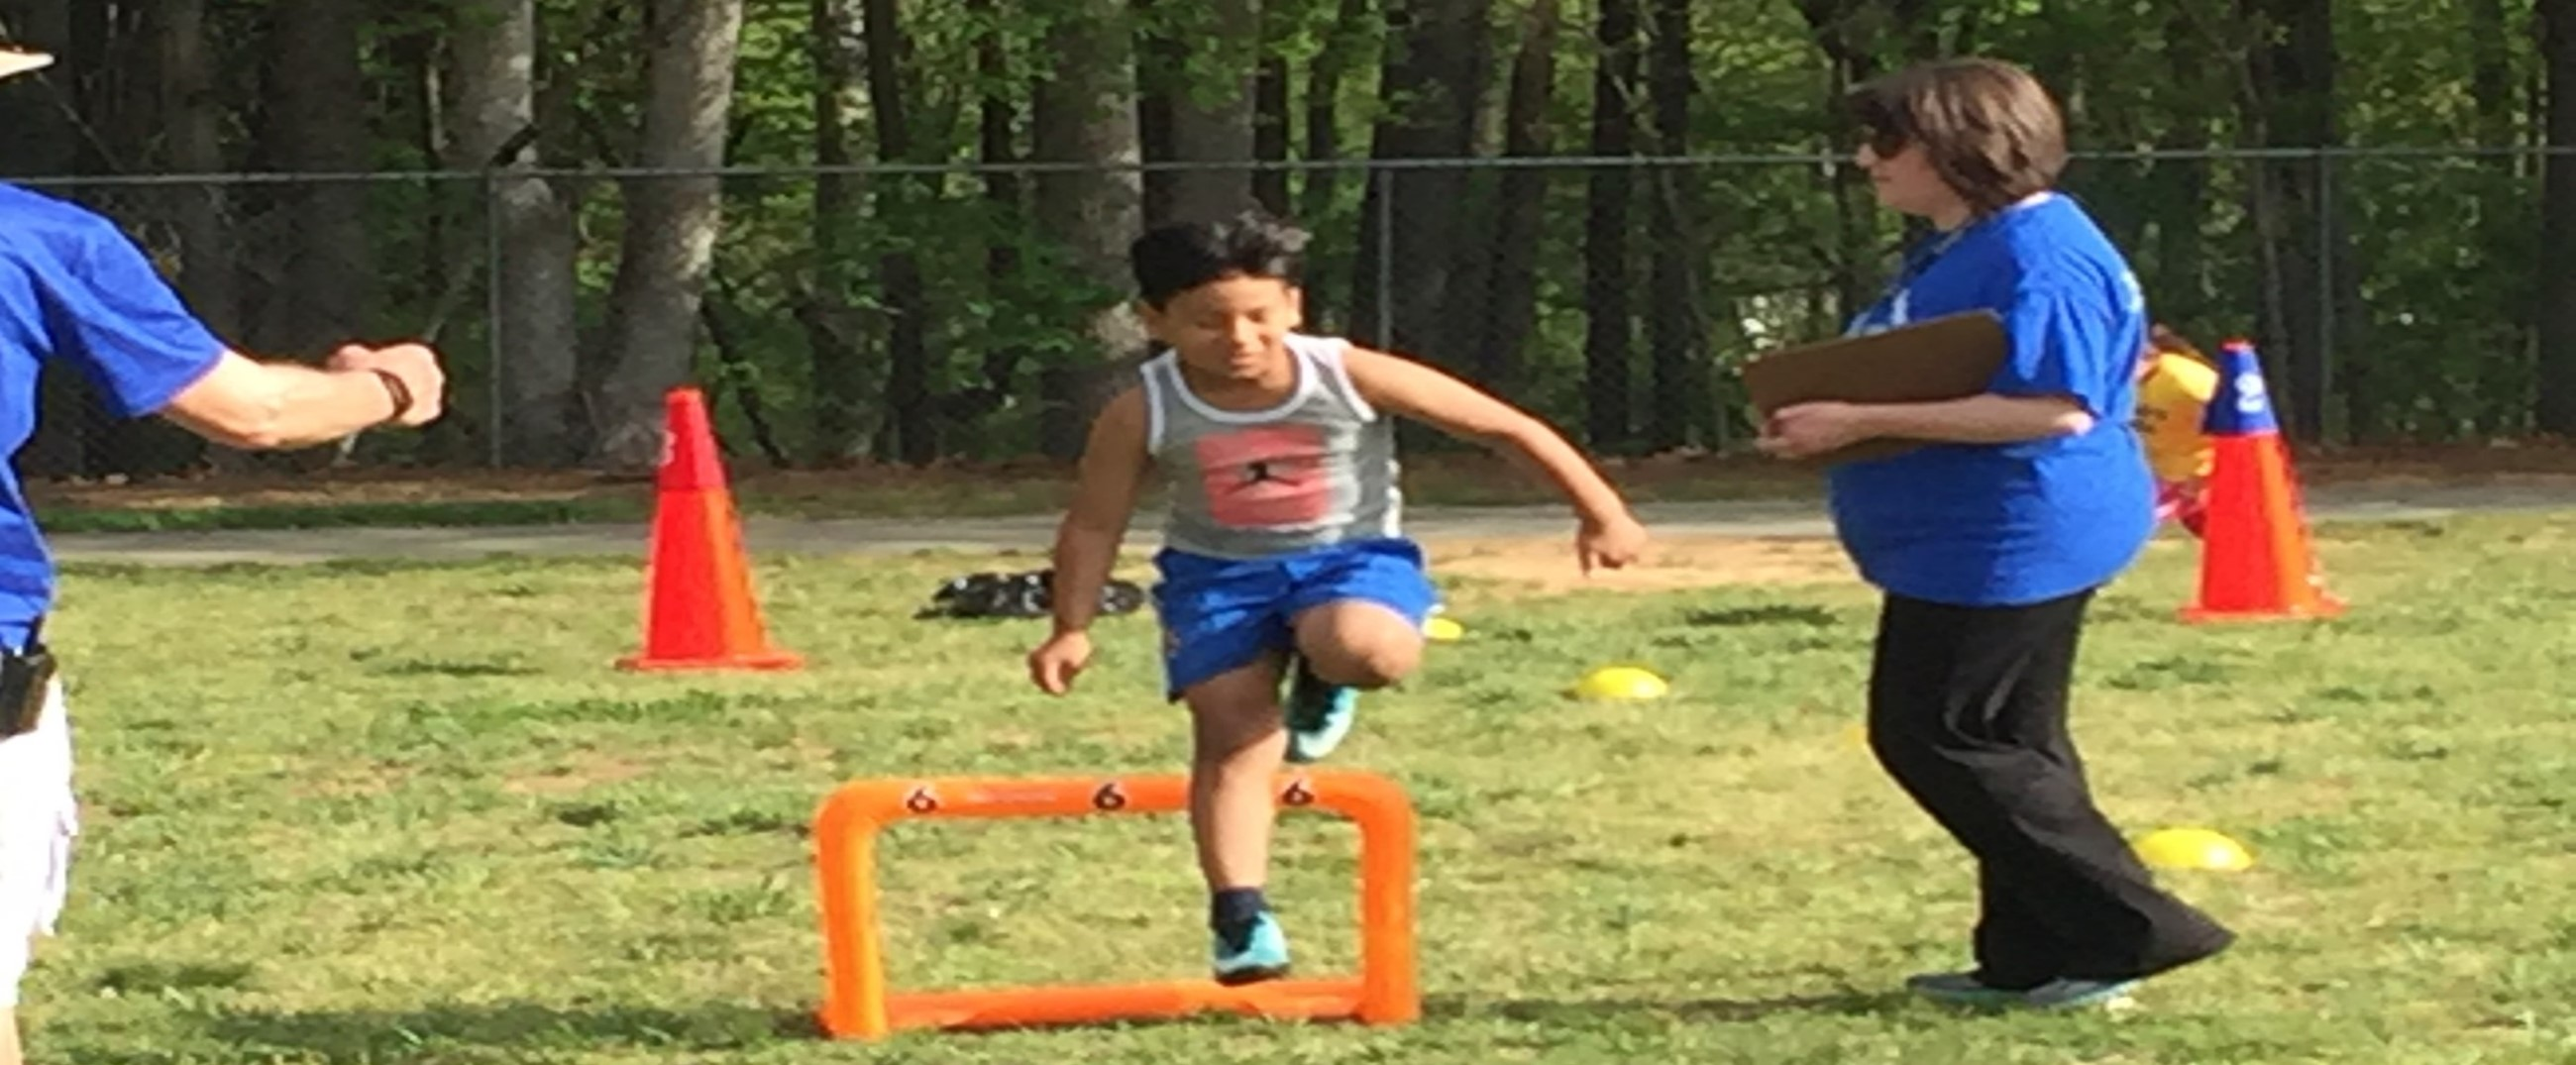 CWM Field Day 2nd grade hurdles